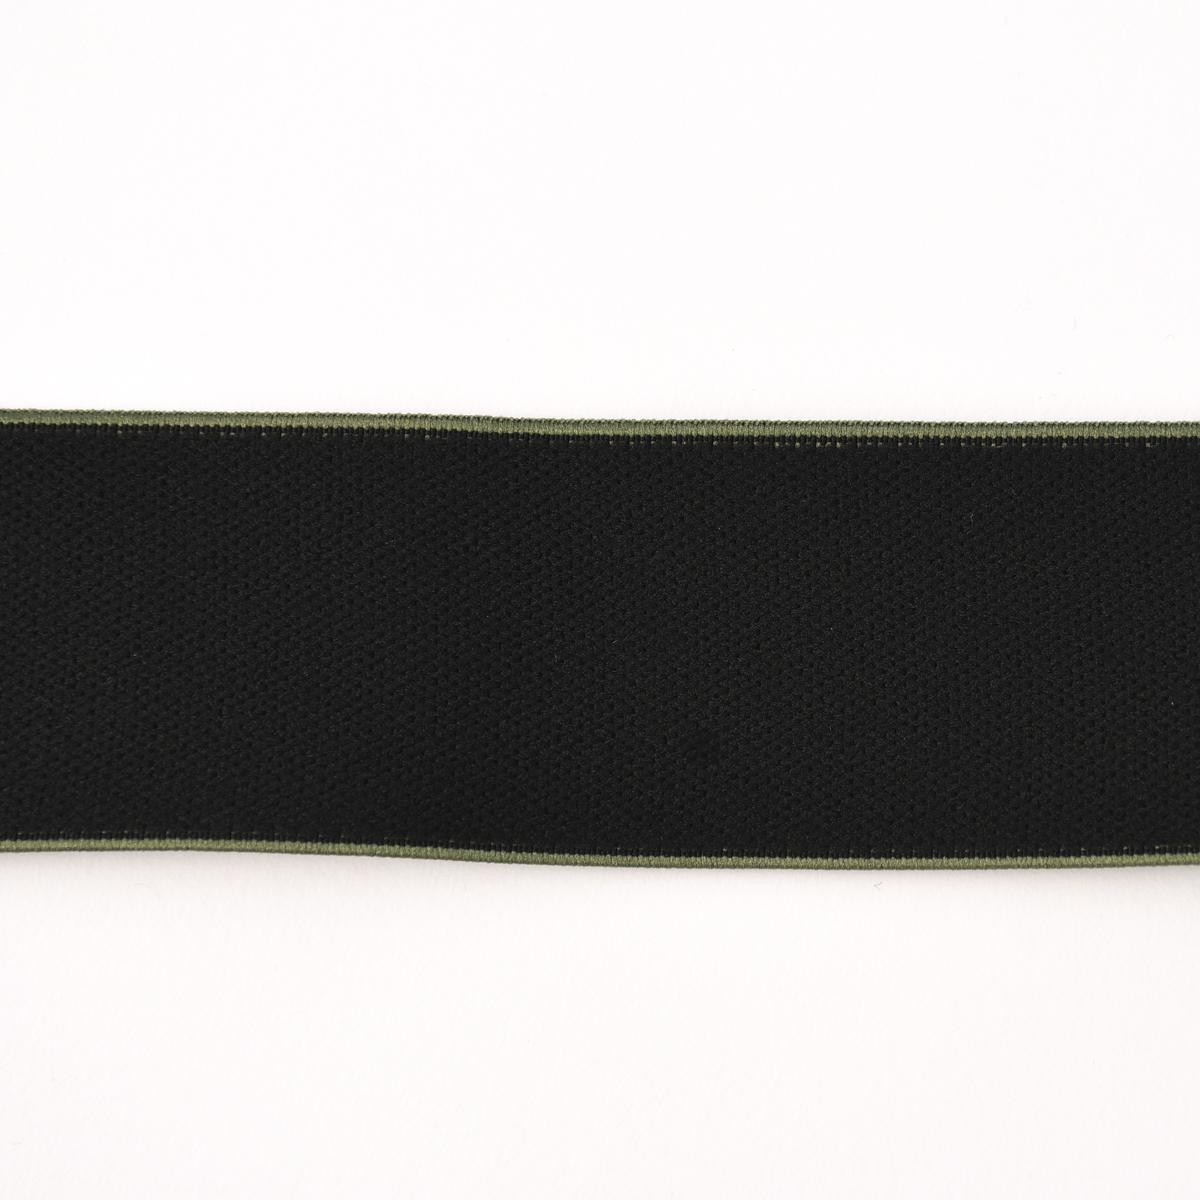 Gummiband mit farbigem Rand schwarz khaki Breite: 4cm